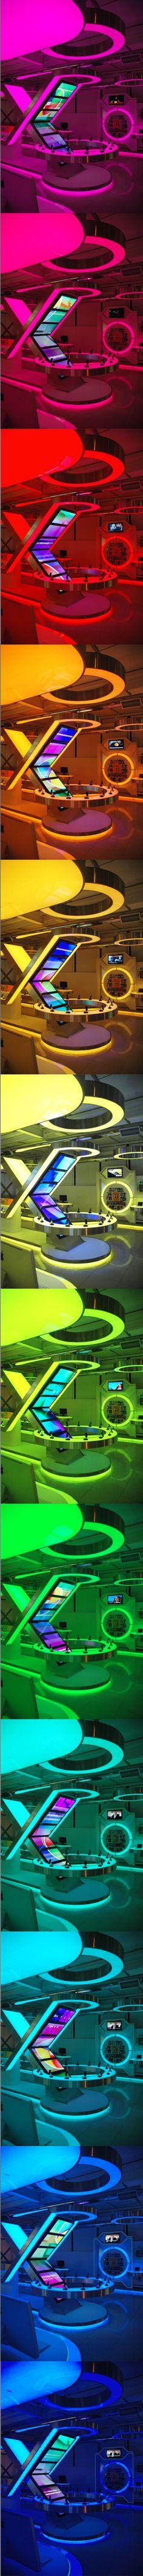 Very cool lighting!  EM FLAGSHIP STORE  Design By Tarkan Cosan & Ugur Erekul #exhibitdesign #lighting